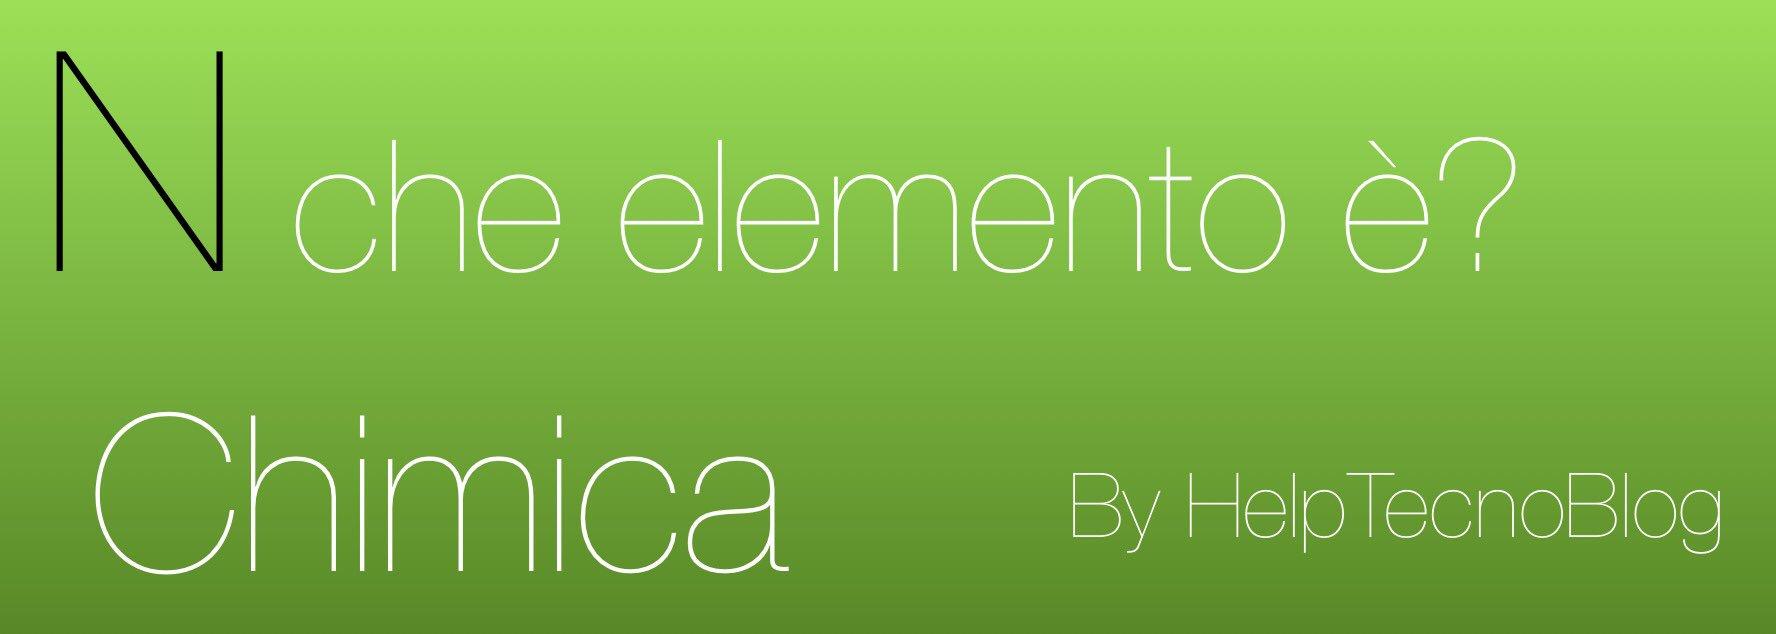 N che elemento ha in chimica